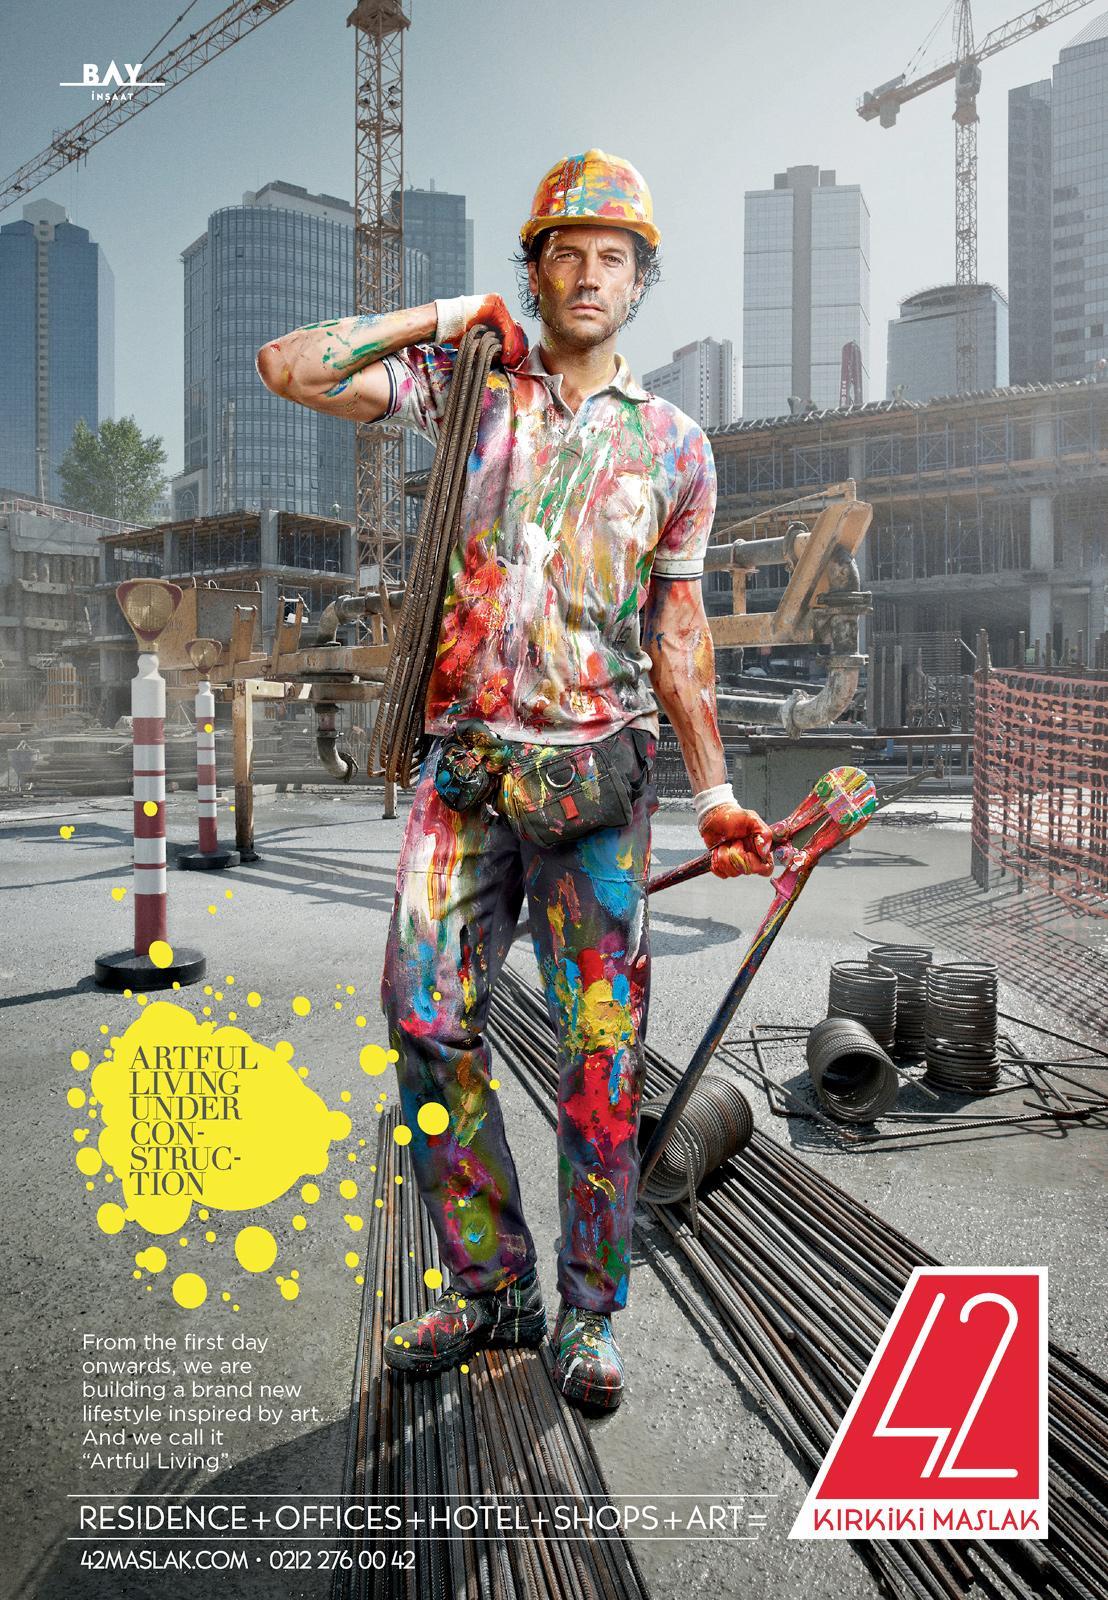 Bay Insaat Print Ad -  Artful Construction, 1